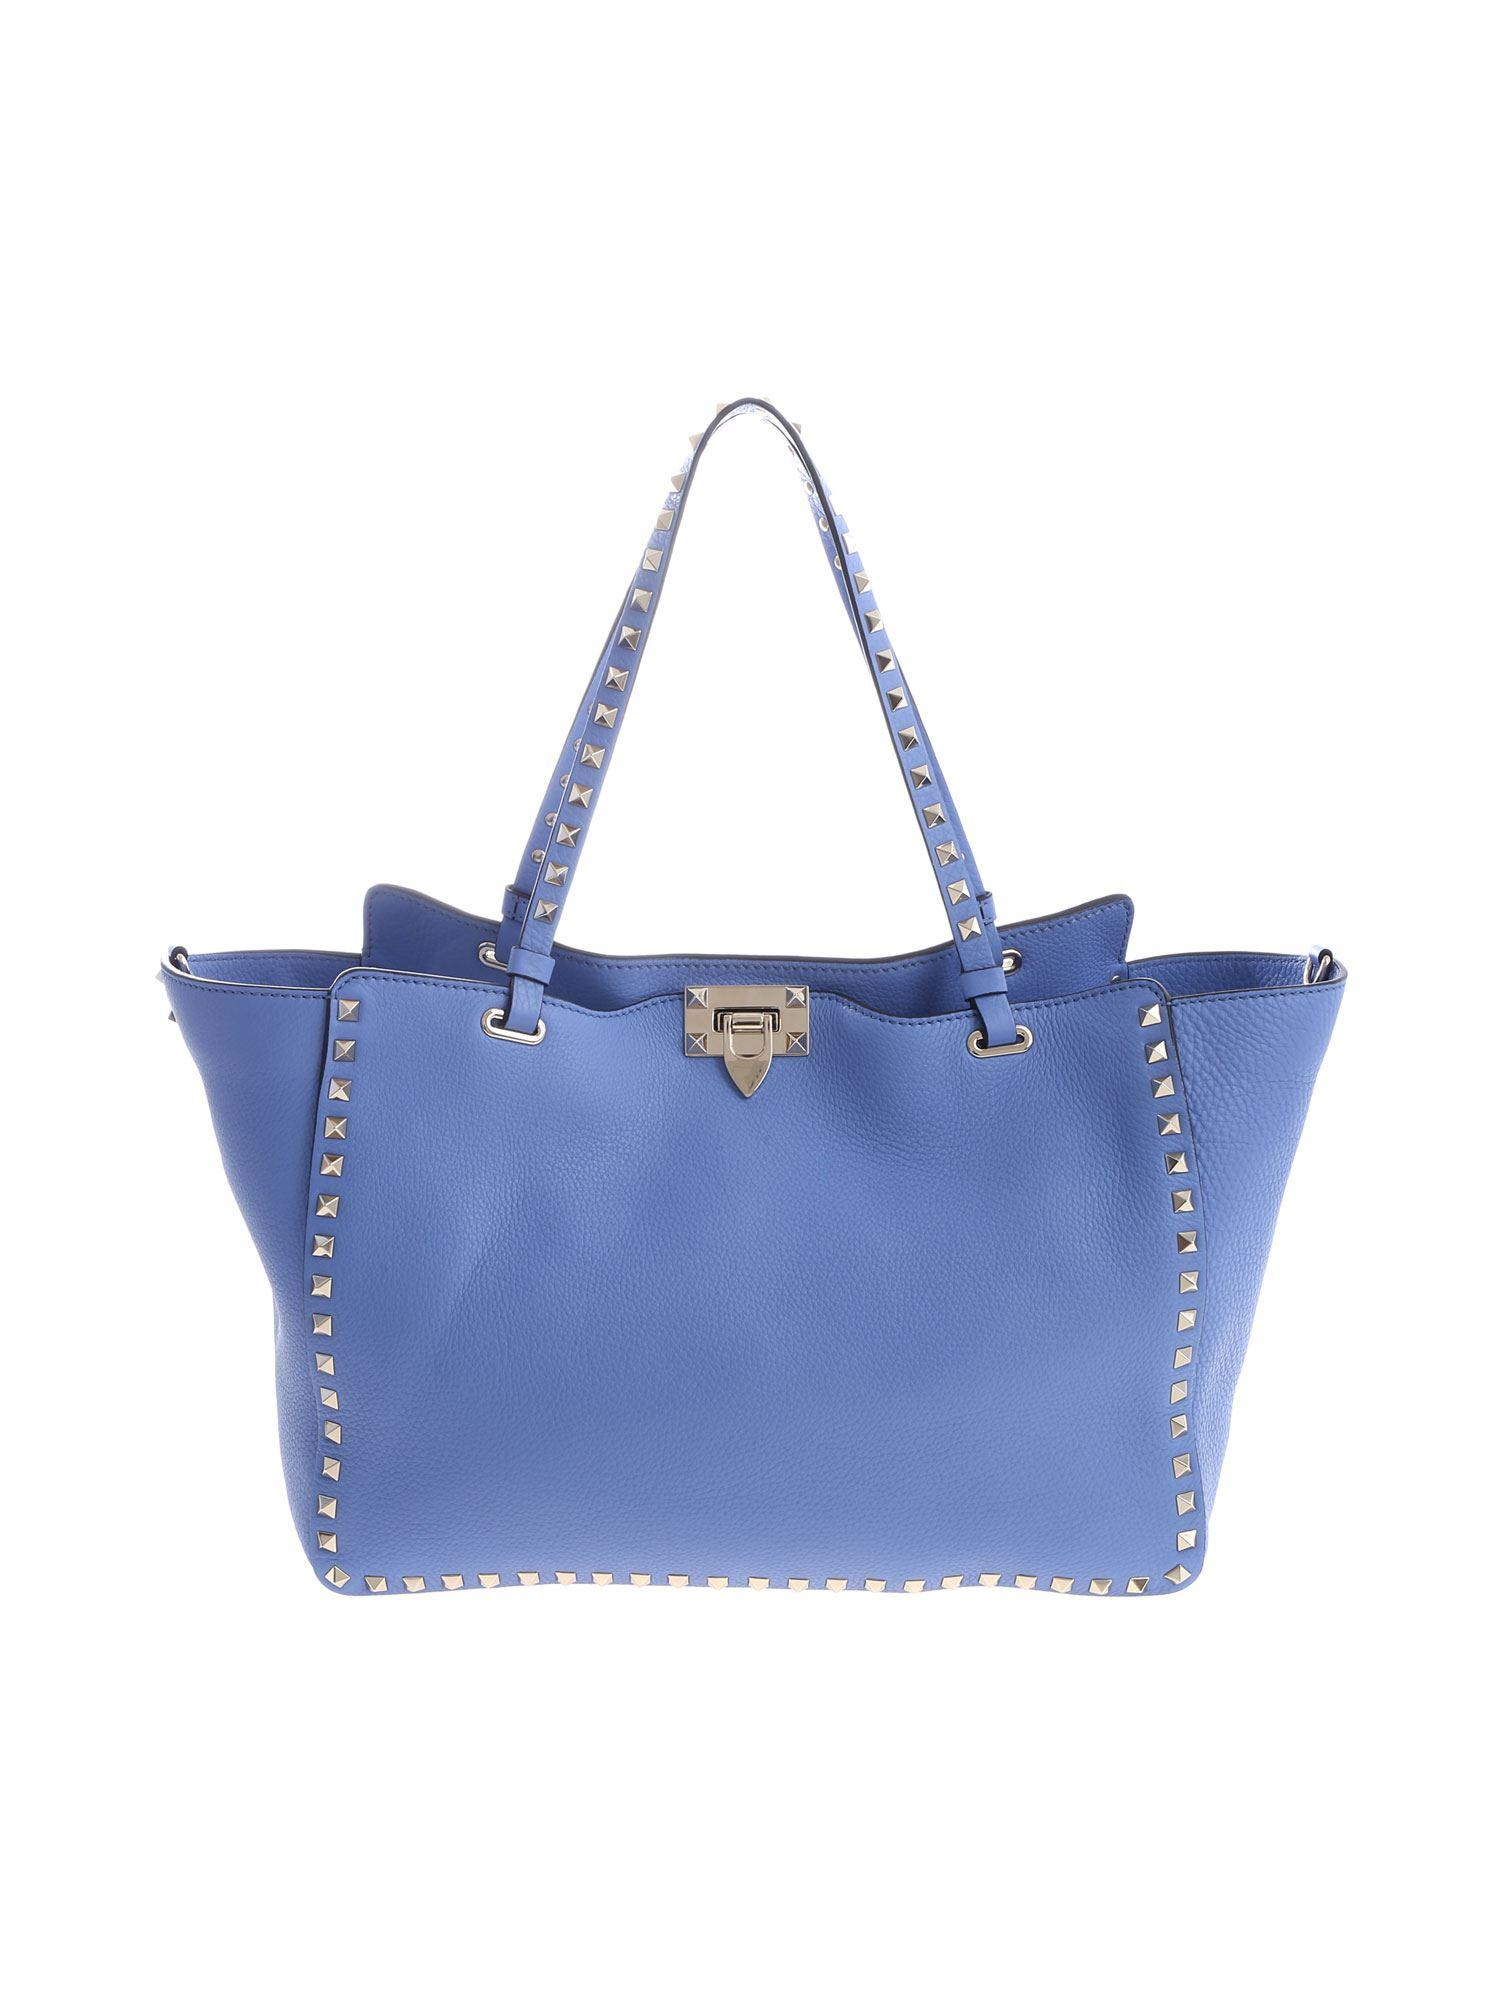 Lyst - Valentino Rockstude Tote Handbag In Light Blue in Blue 8f4bbce42e4ec